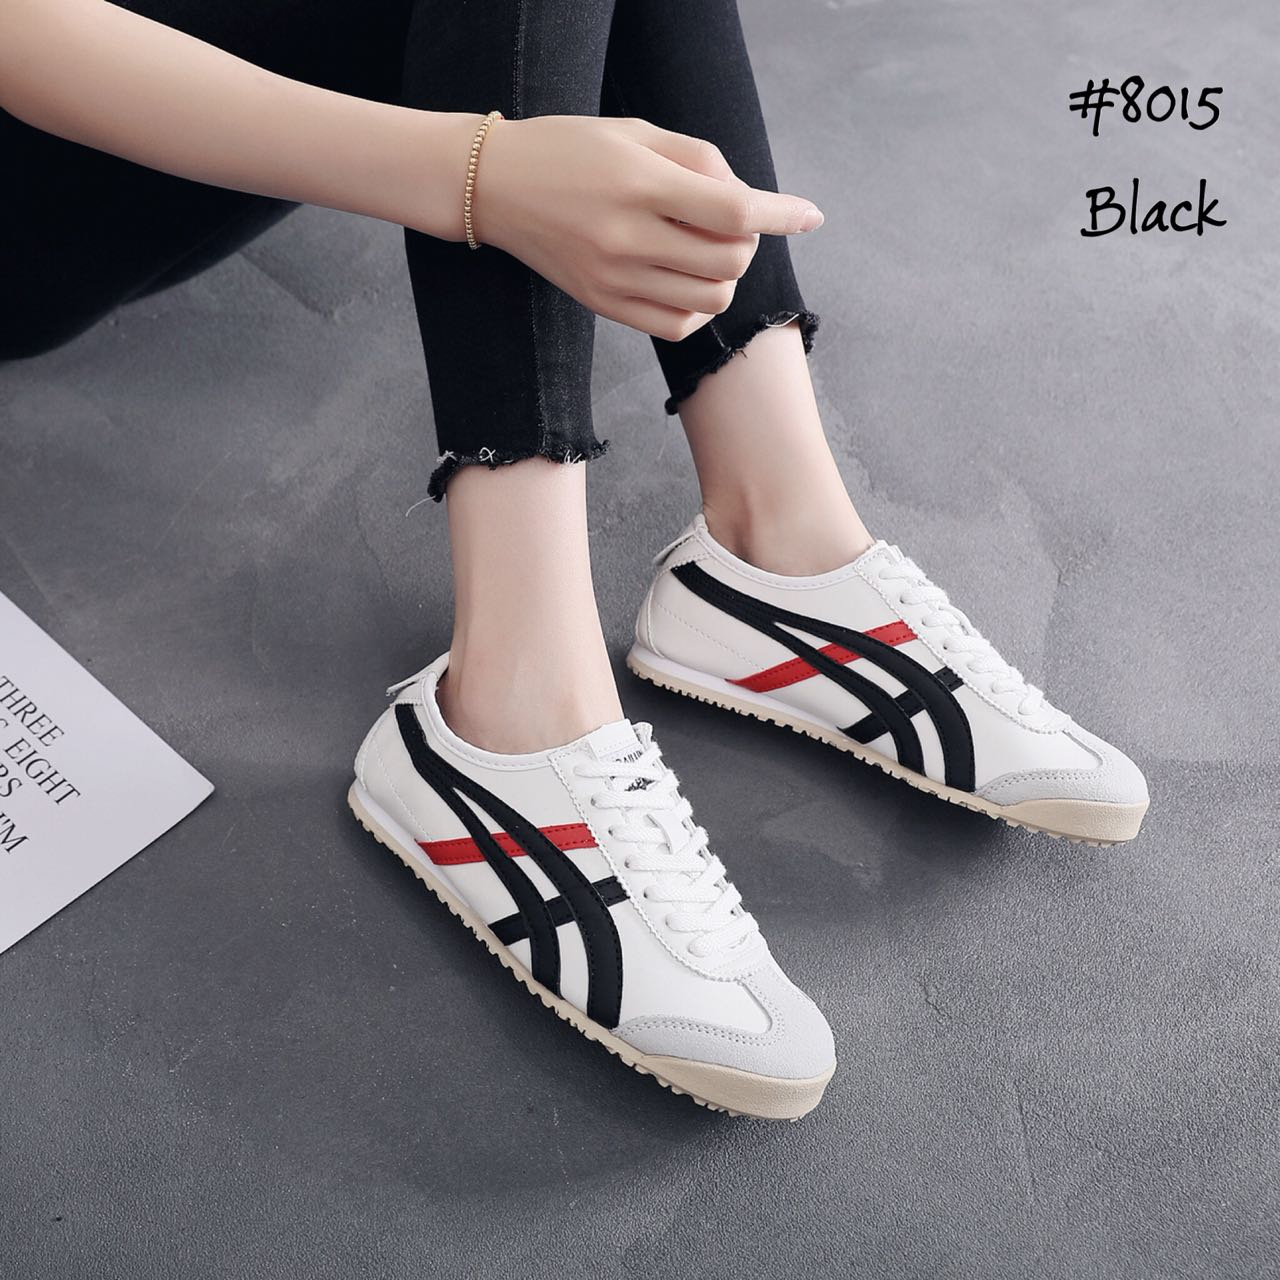 Sepatu Fashion Sneakers Onitsuka Tiger Japan Hitam Semprem Bestseller Murah  8015 a53908e8d6